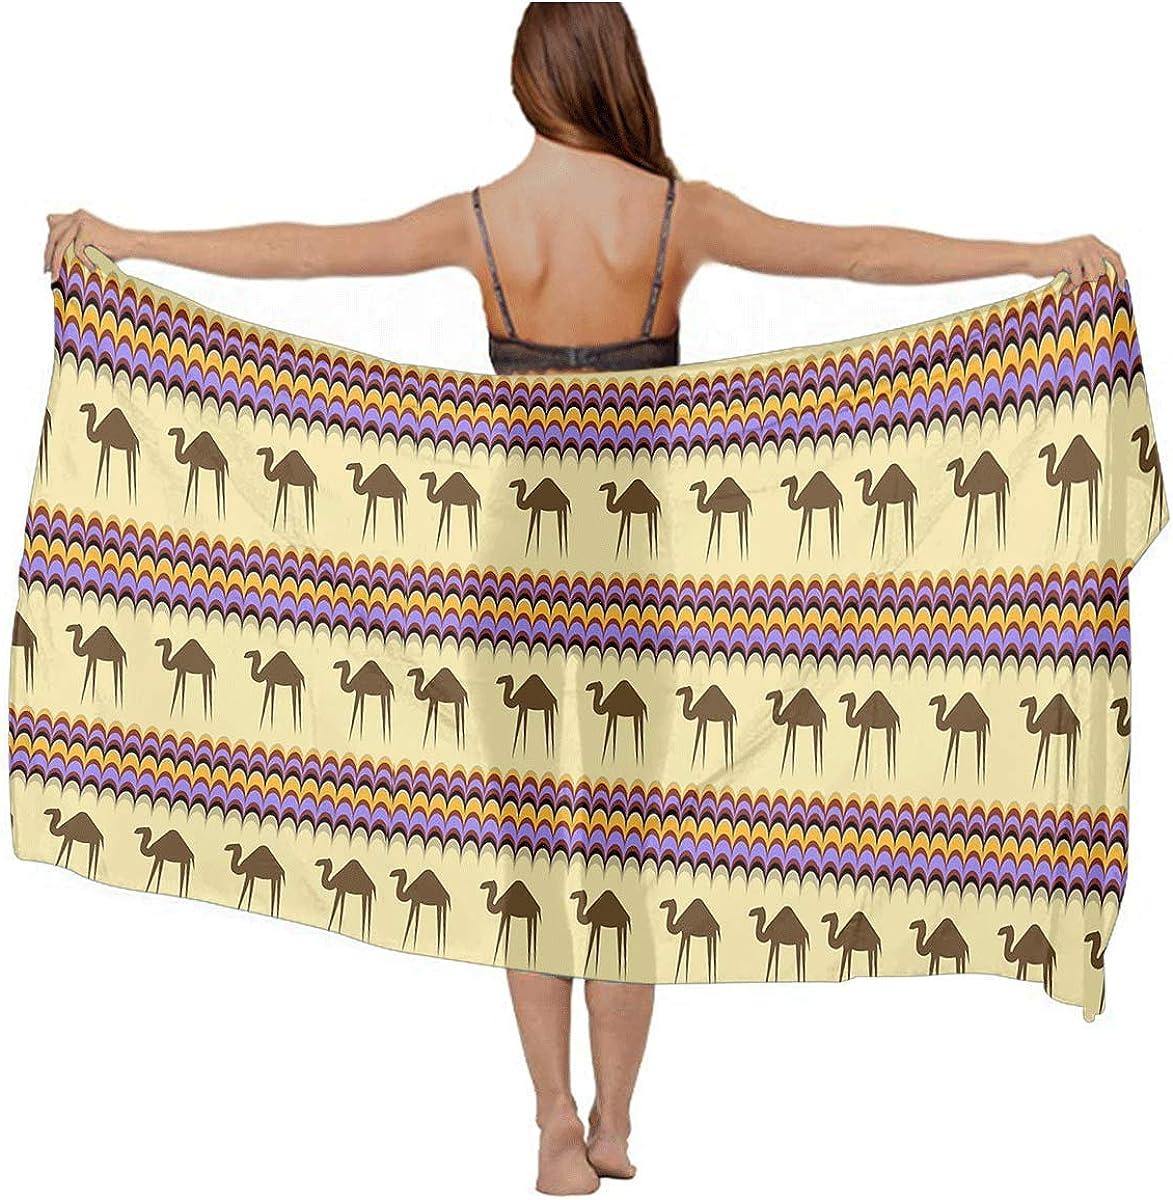 Swimwear Cover Up Beach Sarong Wrap Scarf Skirt Gift